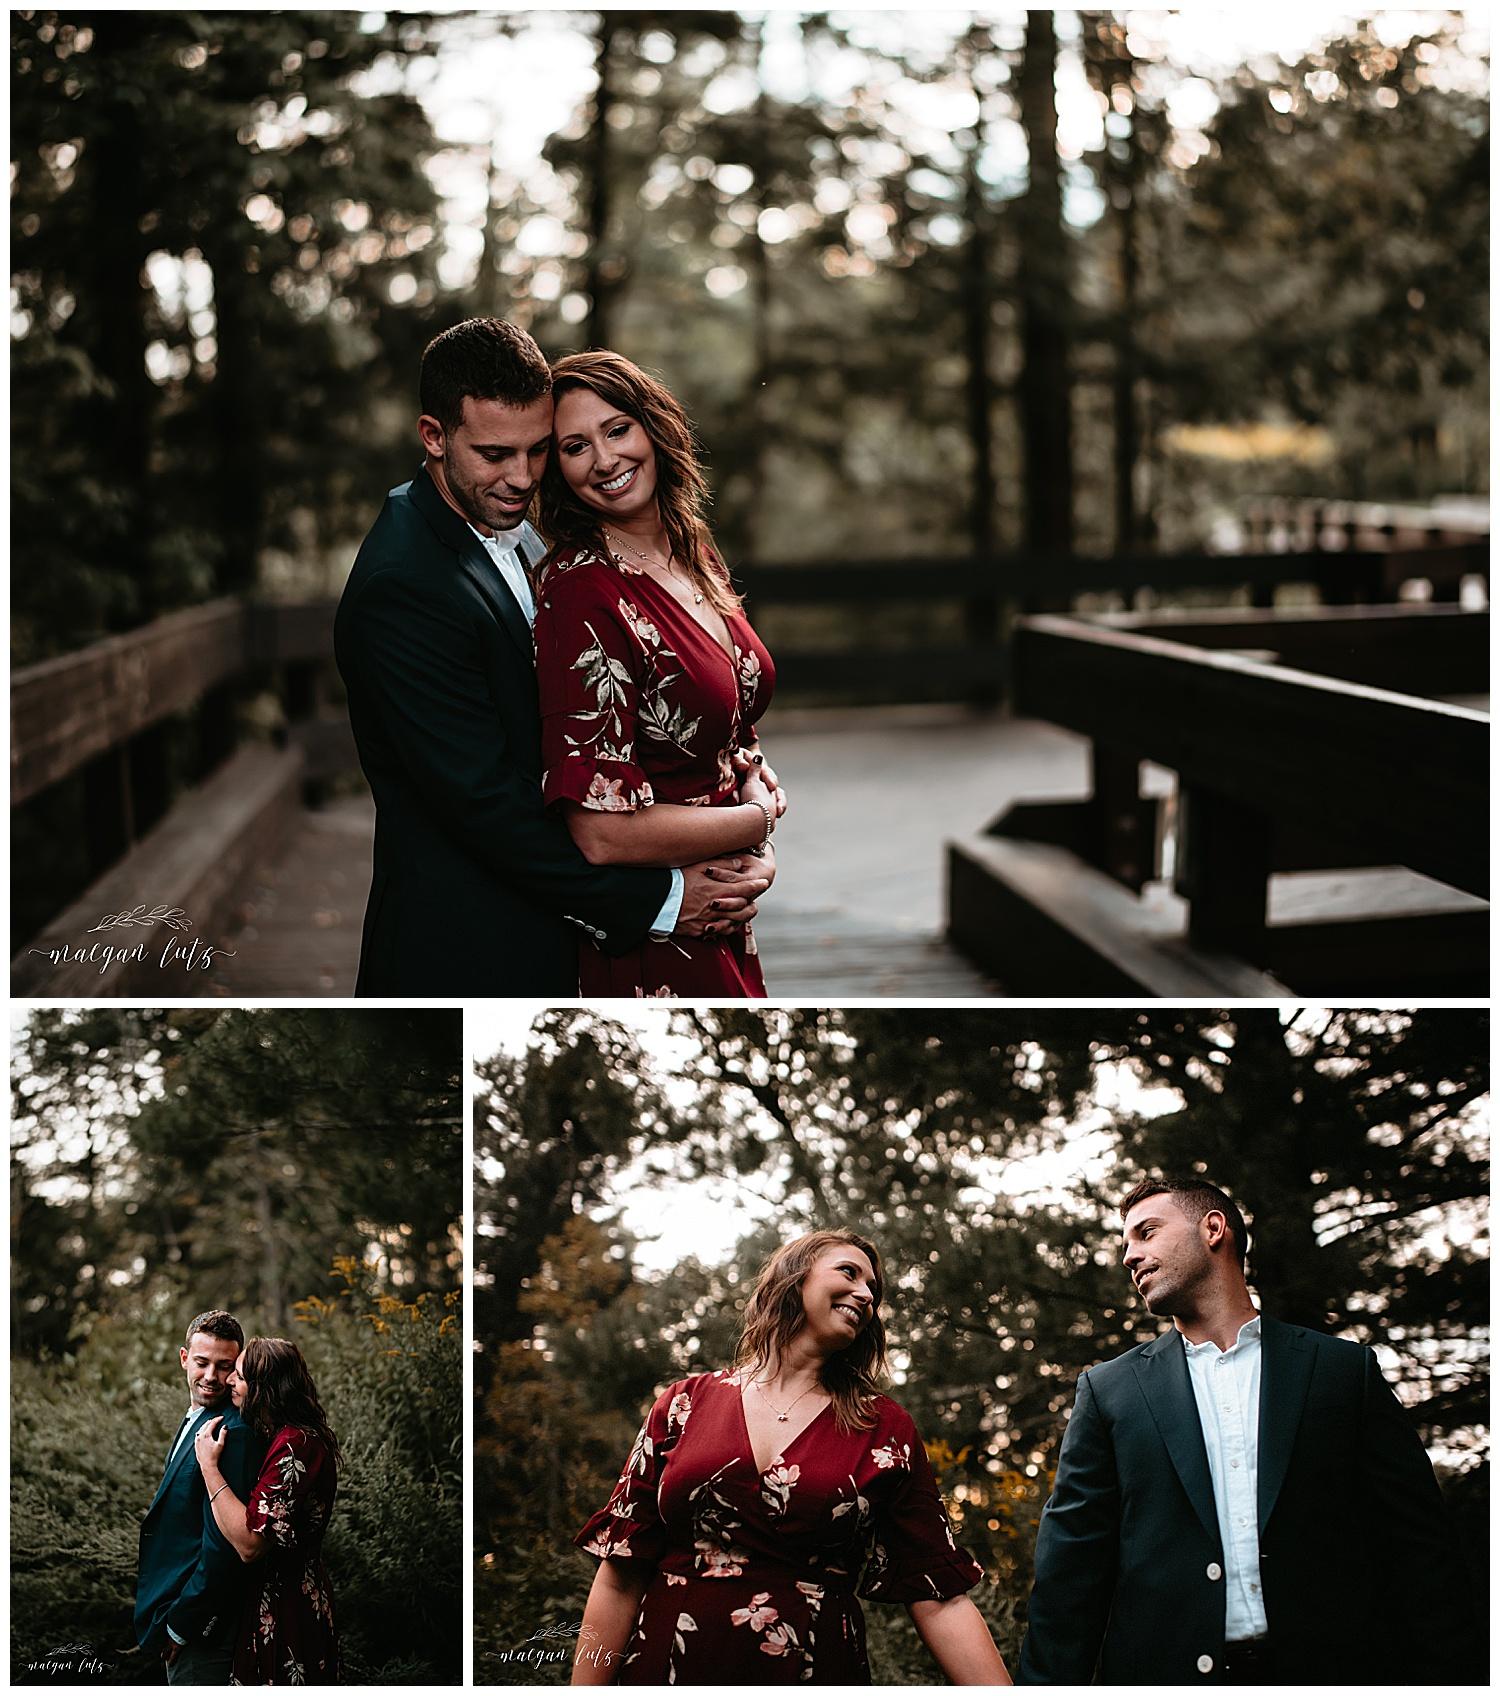 NEPA-Bloomgsburg-Wedding-Photographer-in-the-Lehigh-Valley_0010.jpg